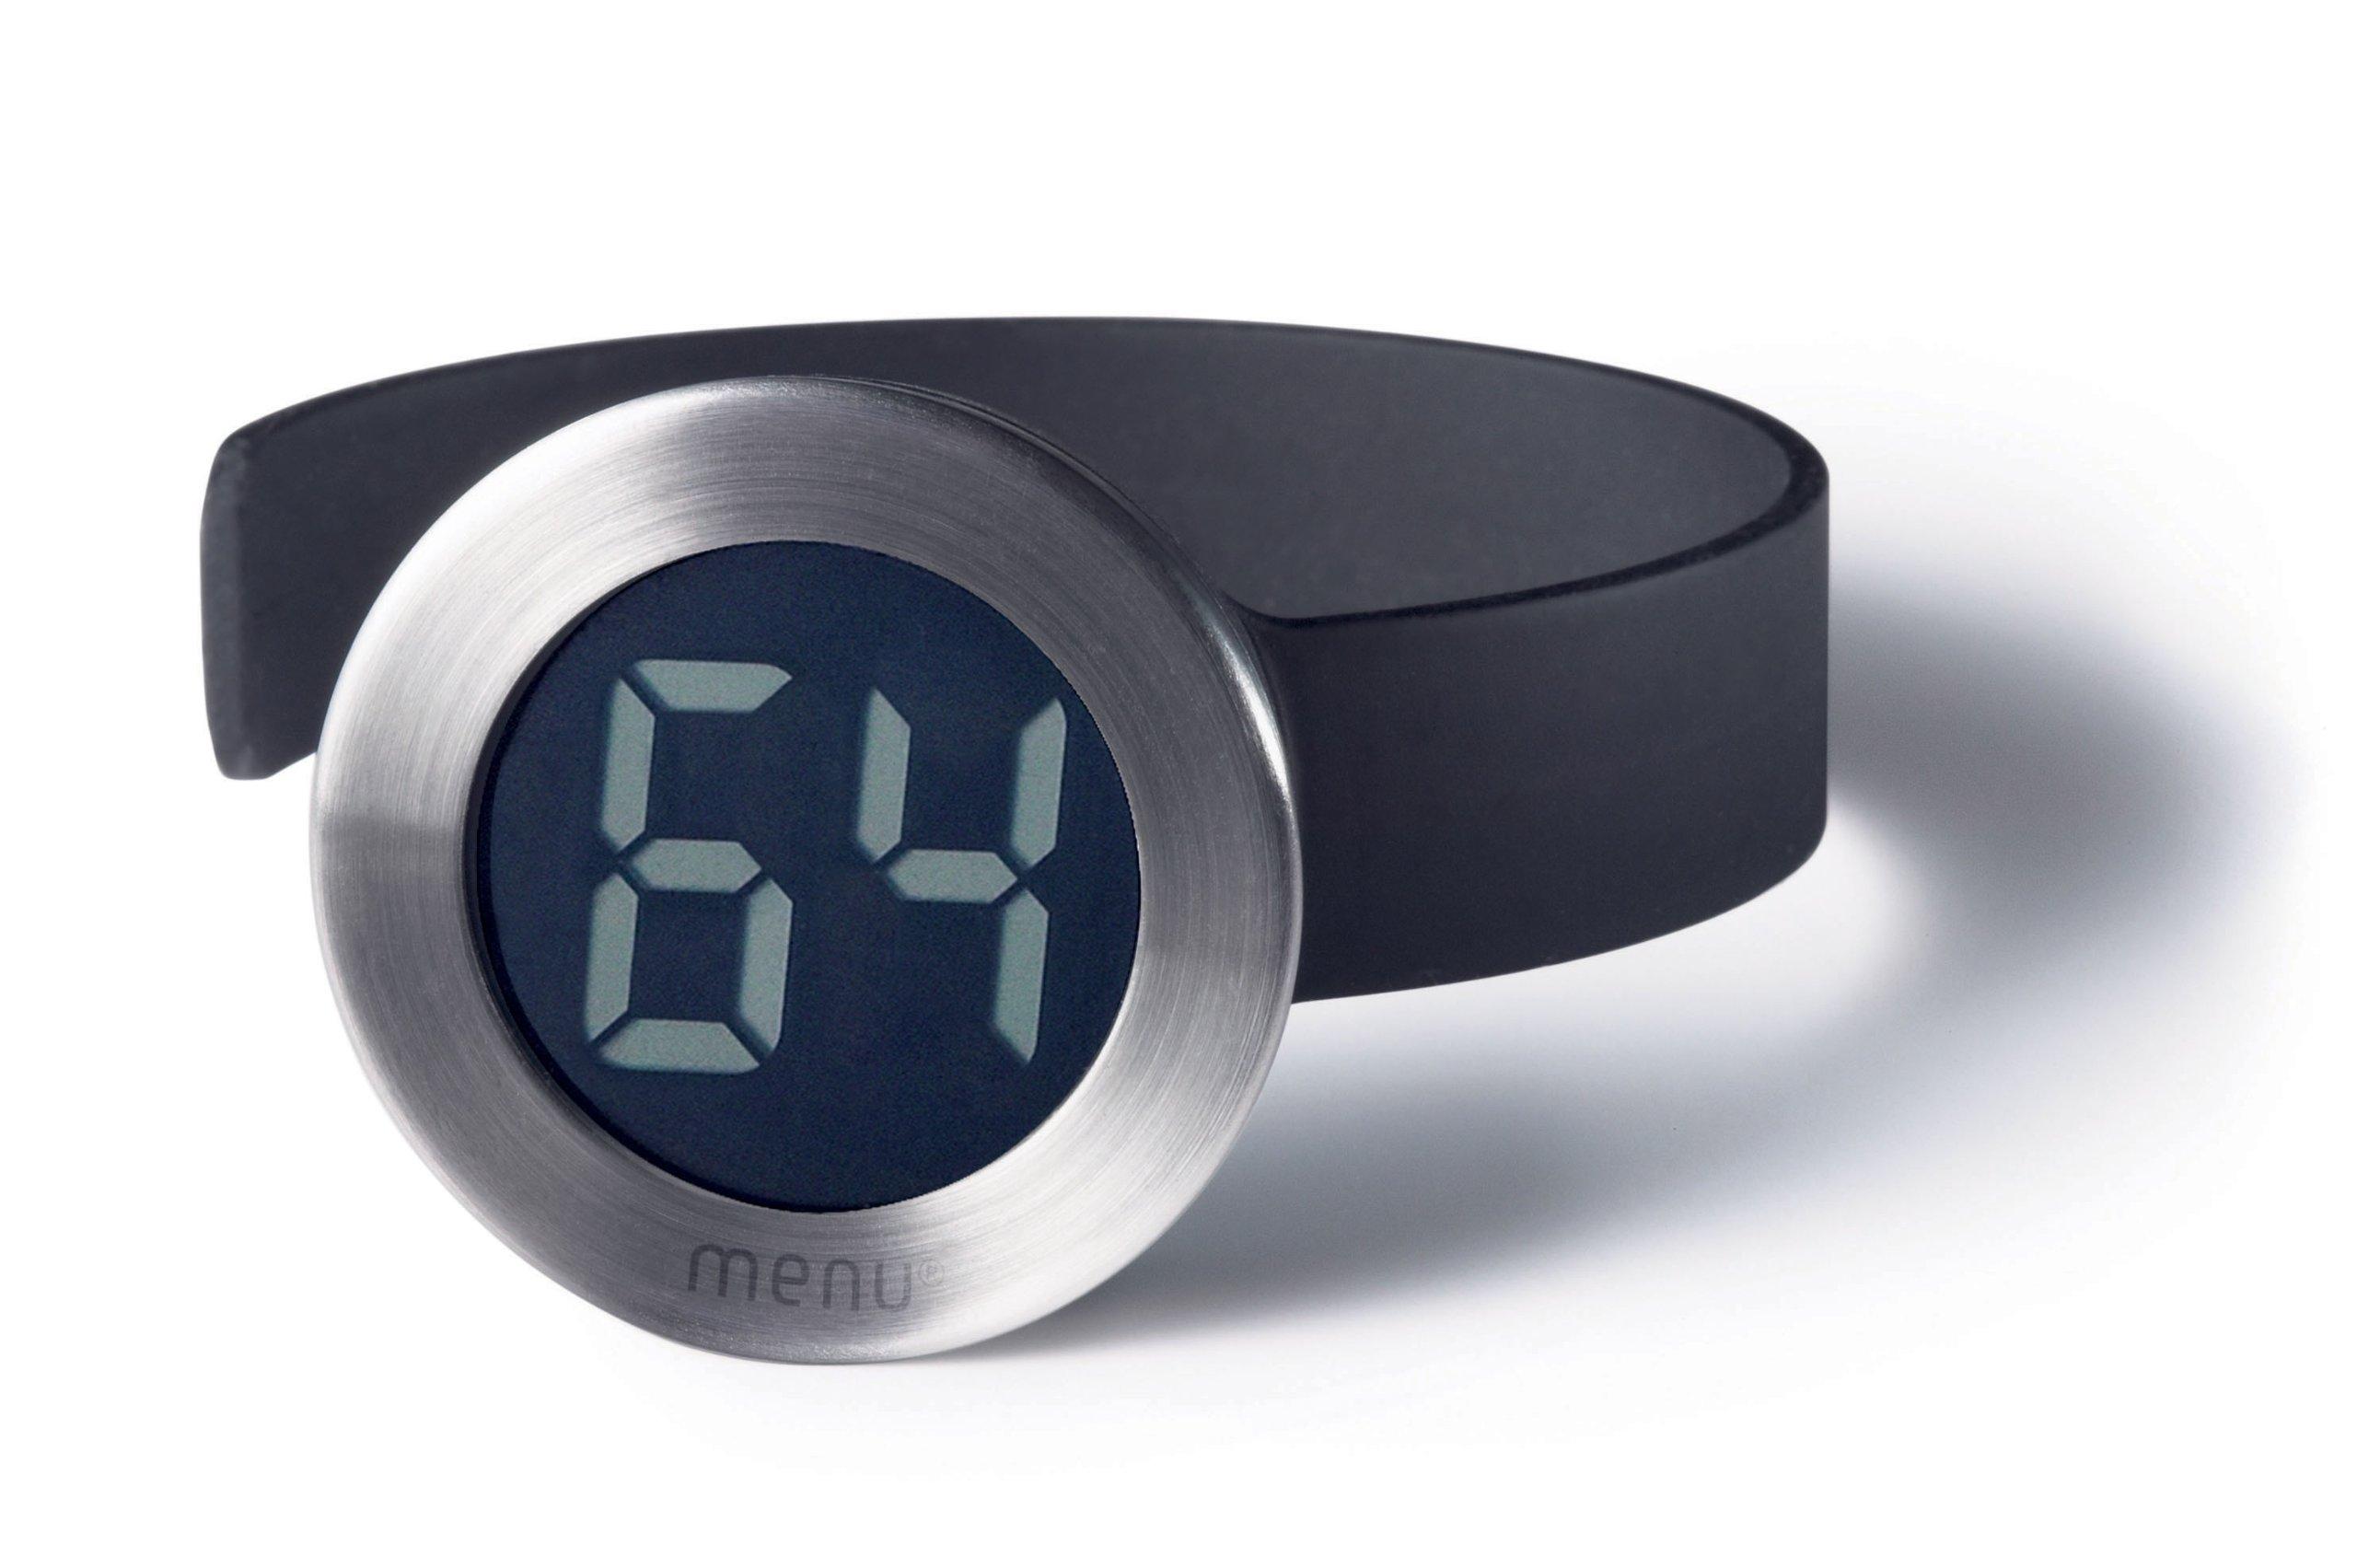 Menu Fahrenheit Wine Thermometer by Menu